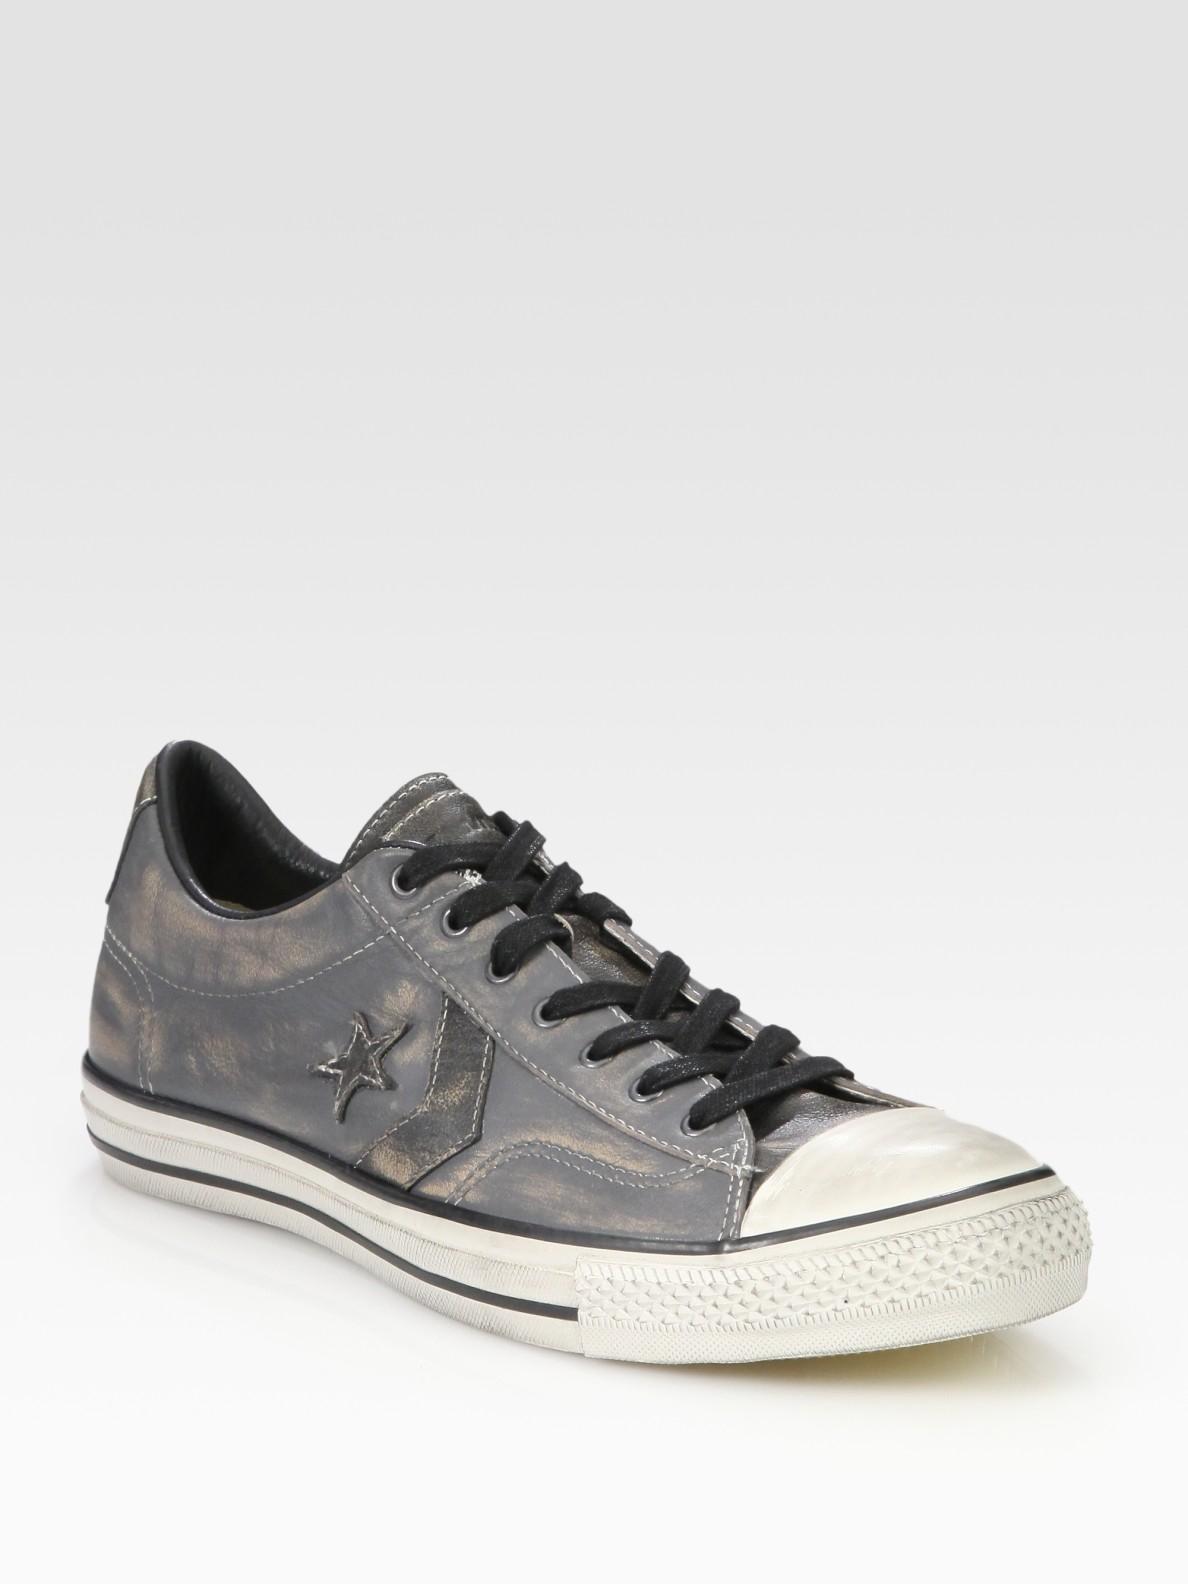 Converse John Varvatos Shoes Nordstrom